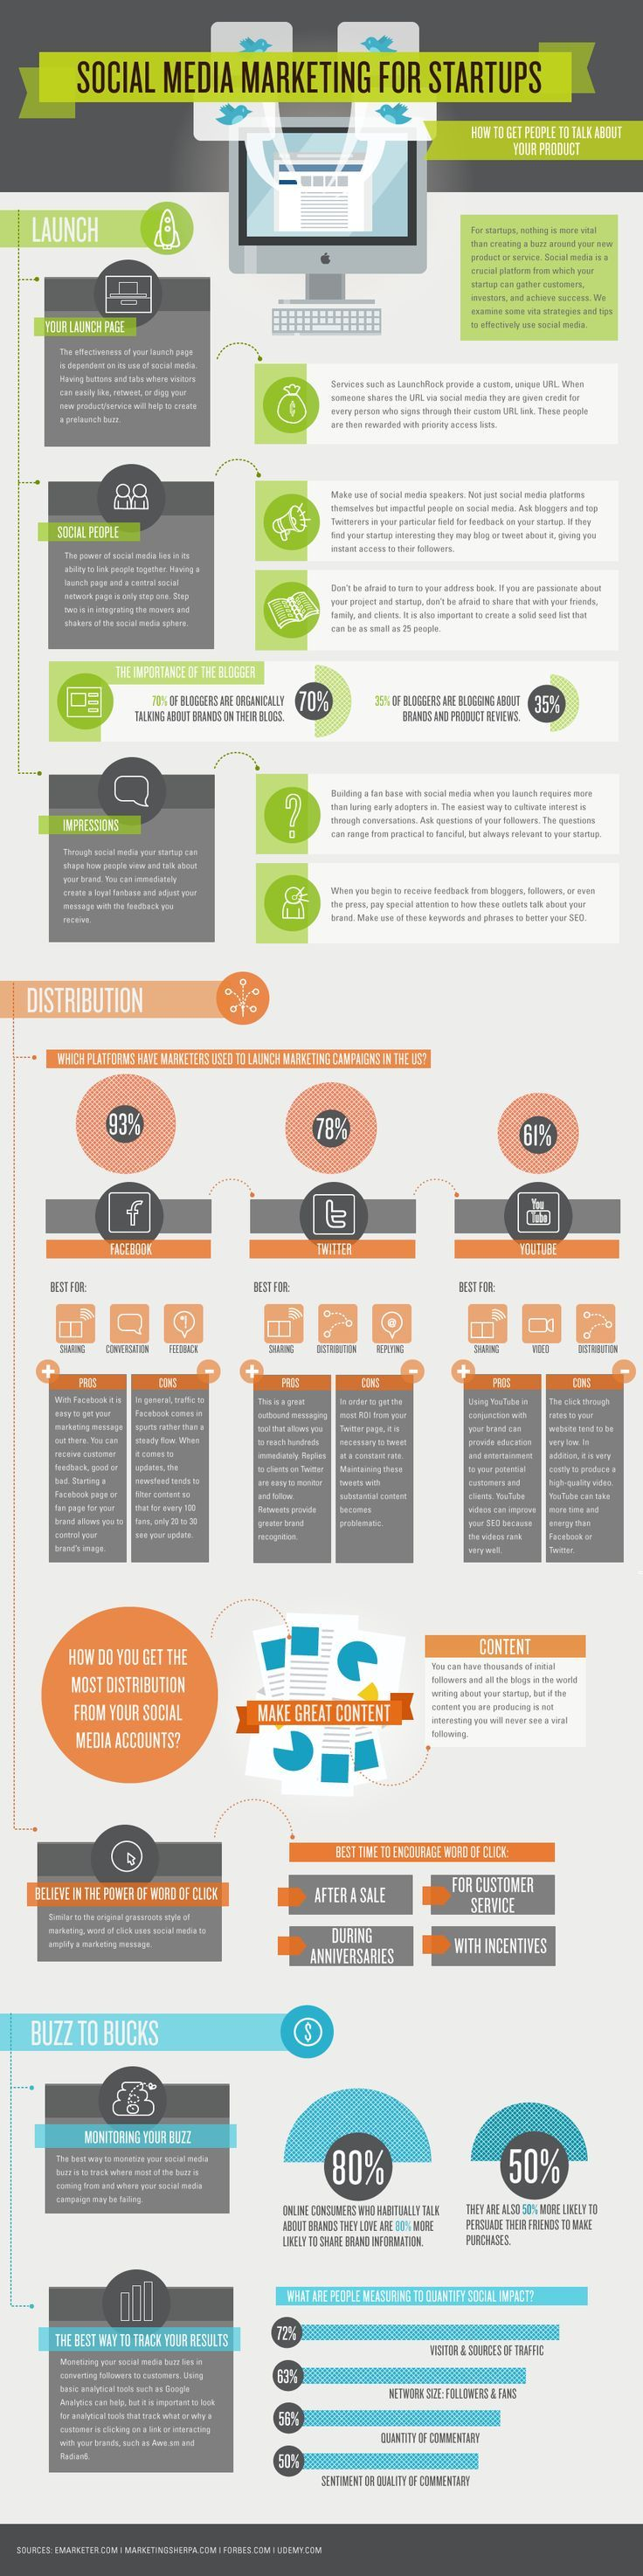 Social Media Marketing for Startups infographic (scheduled via http://www.tailwindapp.com?utm_source=pinterest&utm_medium=twpin&utm_content=post274067&utm_campaign=scheduler_attribution)